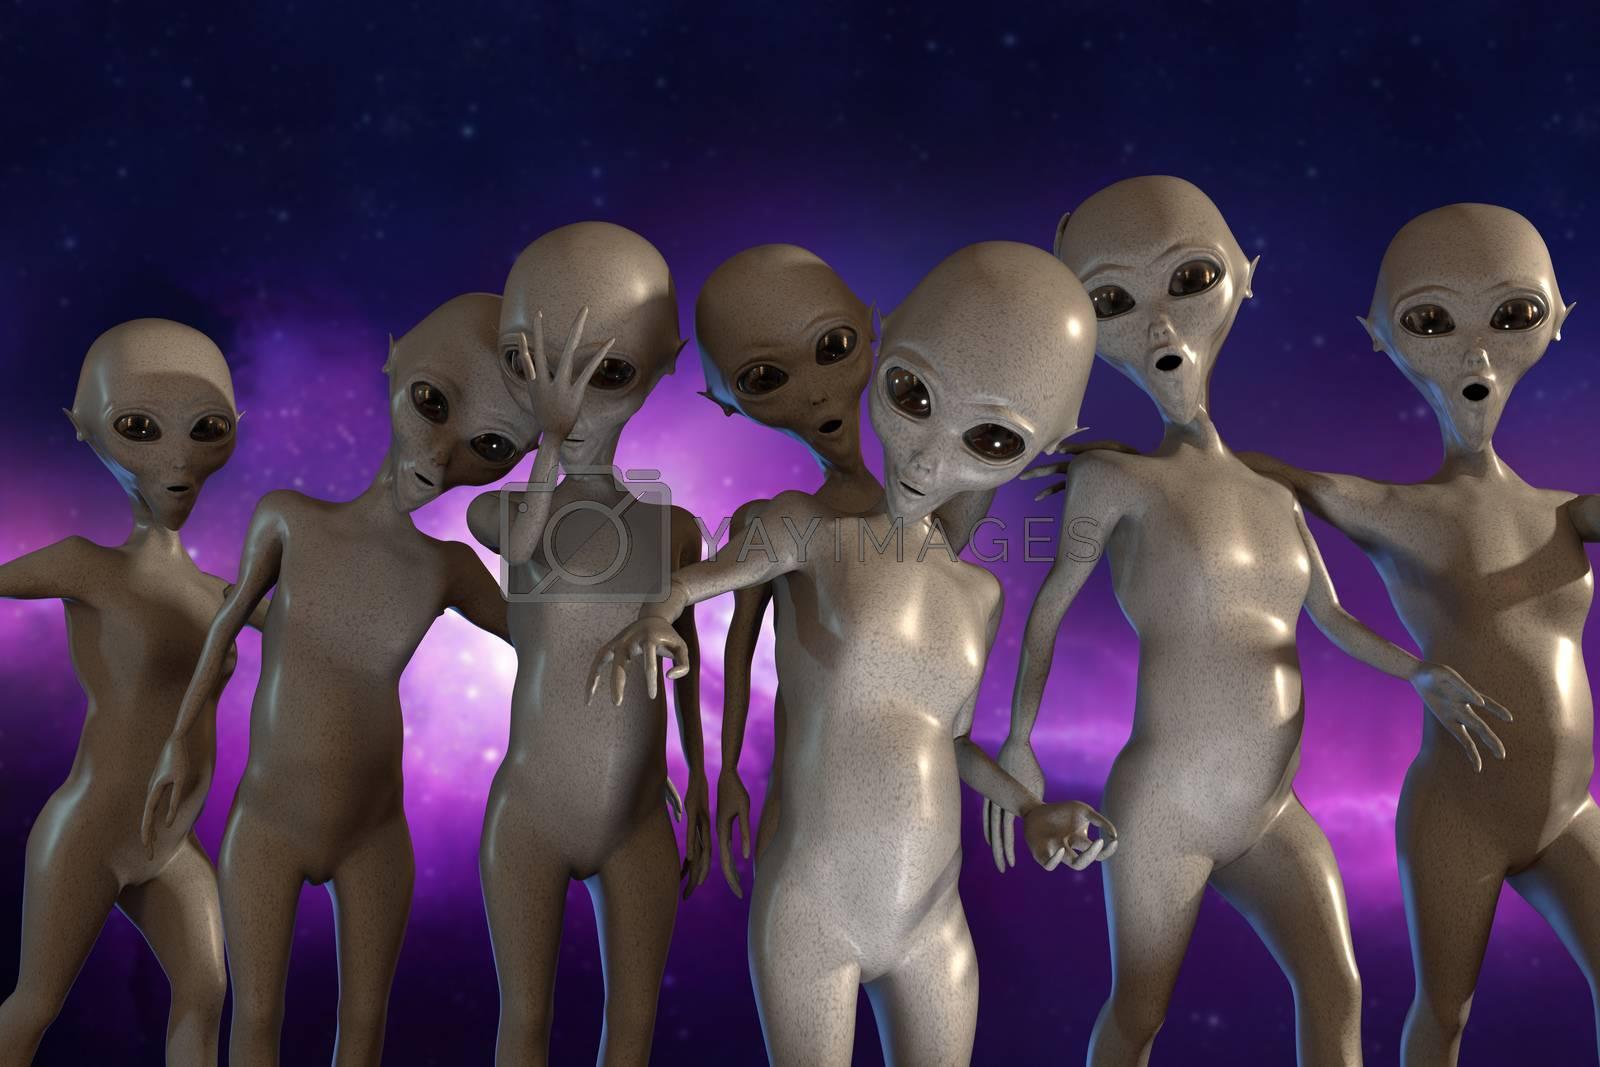 aliens by andreacrisante